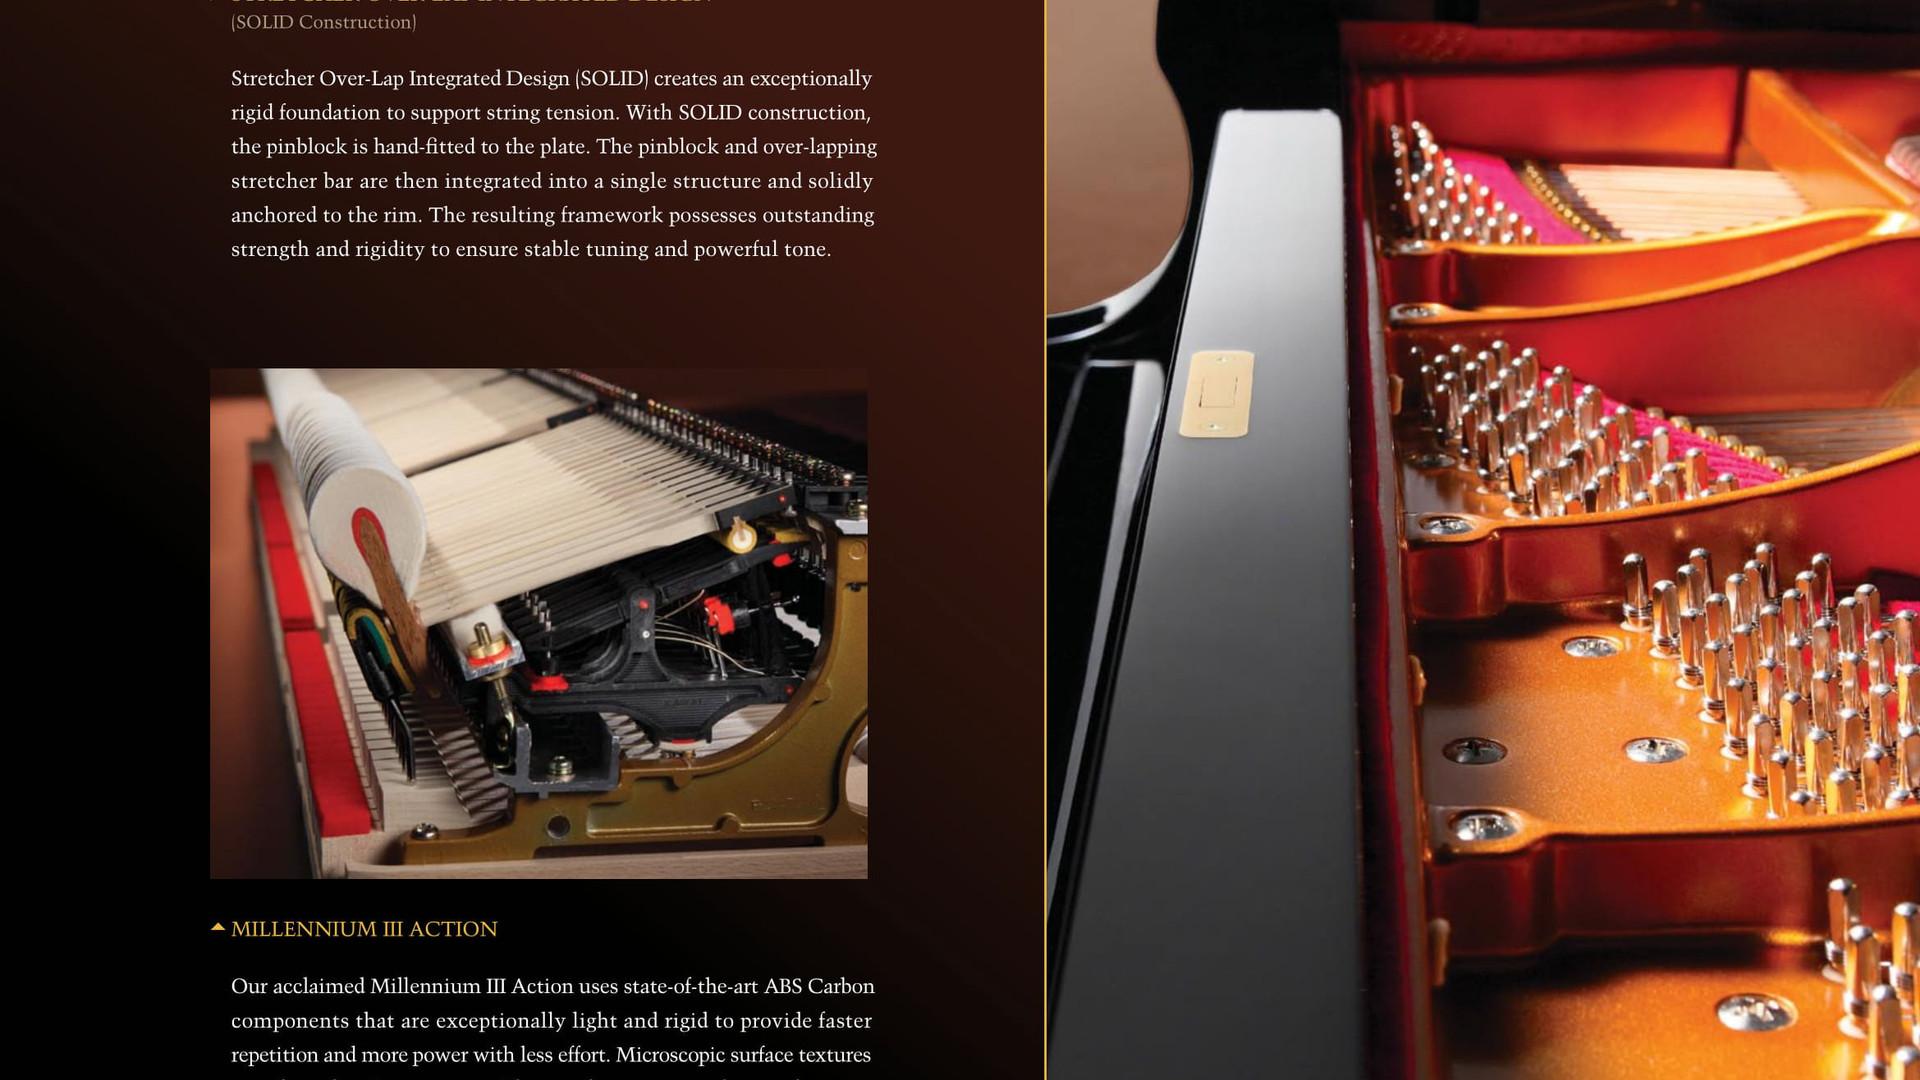 EX-Concert-Grand-Brochure-15.jpg